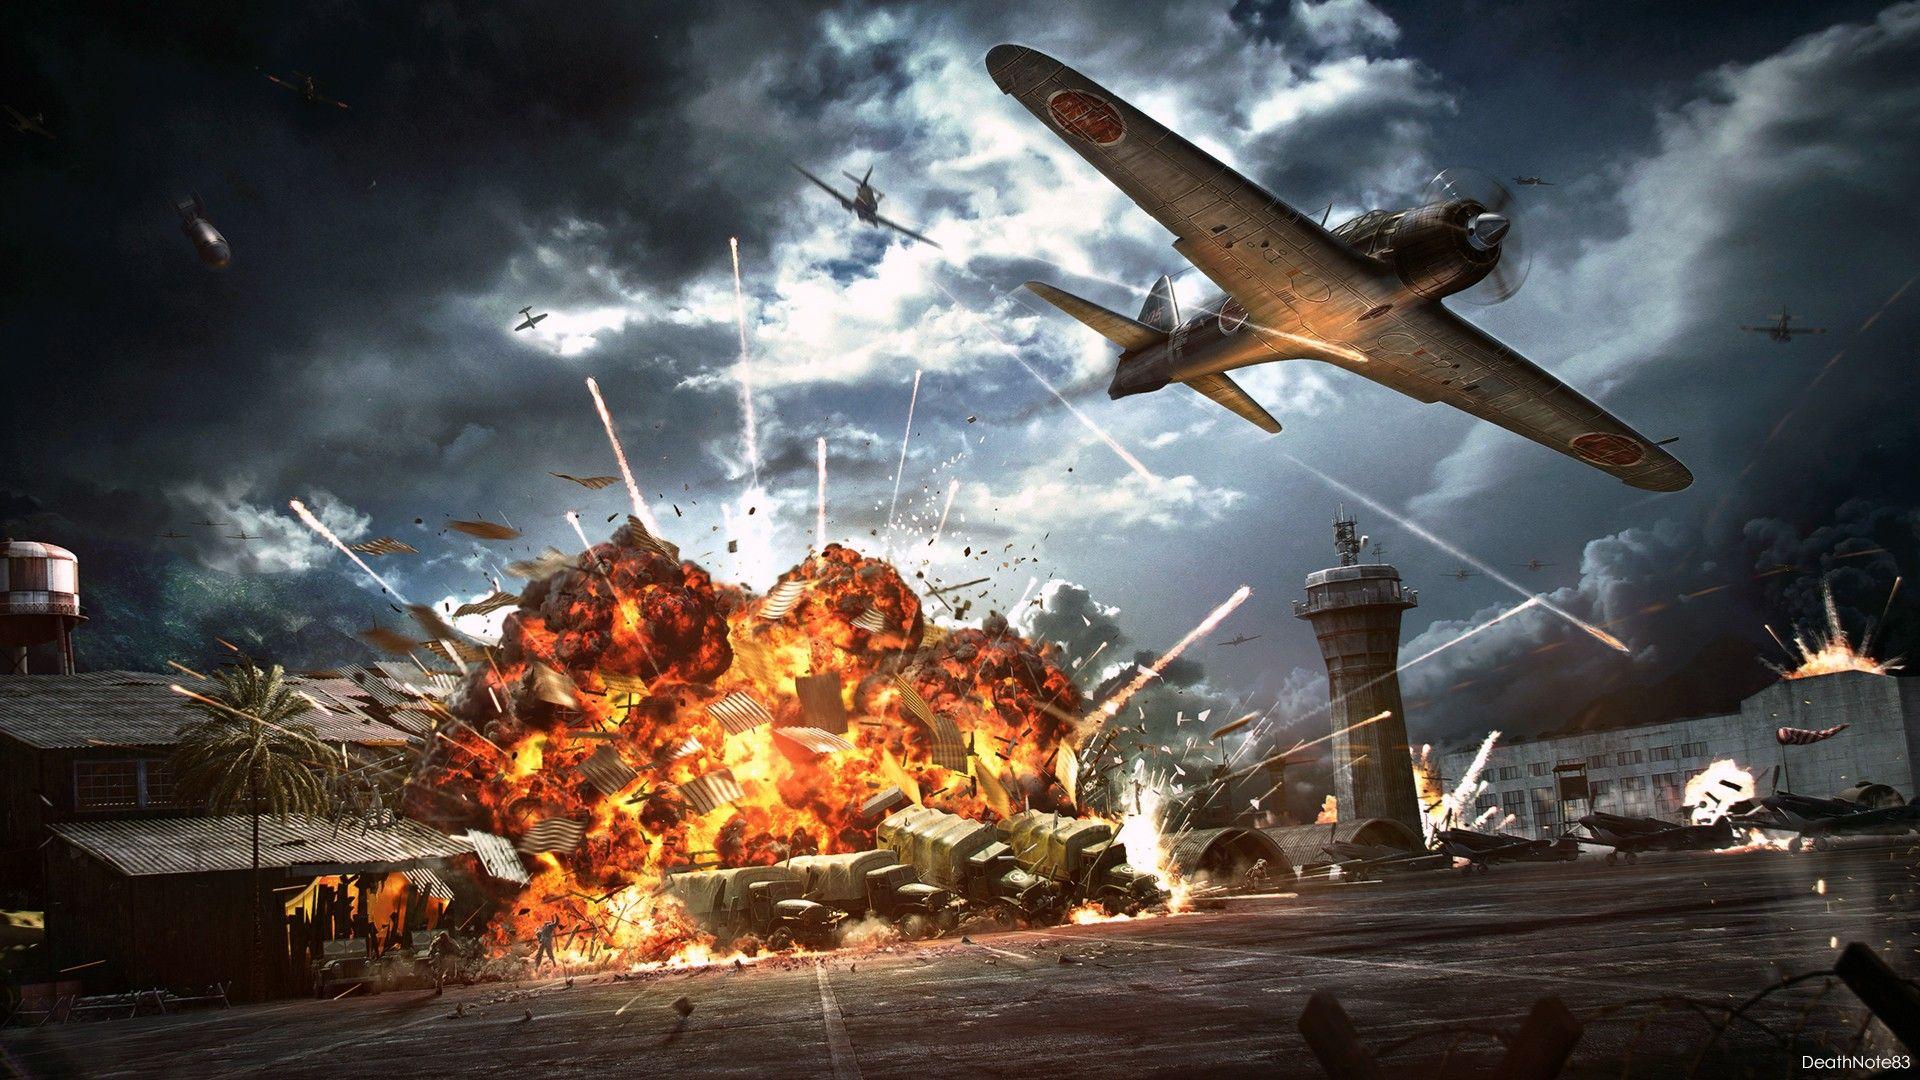 Military Battle Wallpaper Pearl Harbor Pearl Harbor Attack Pearl Harbor Movie